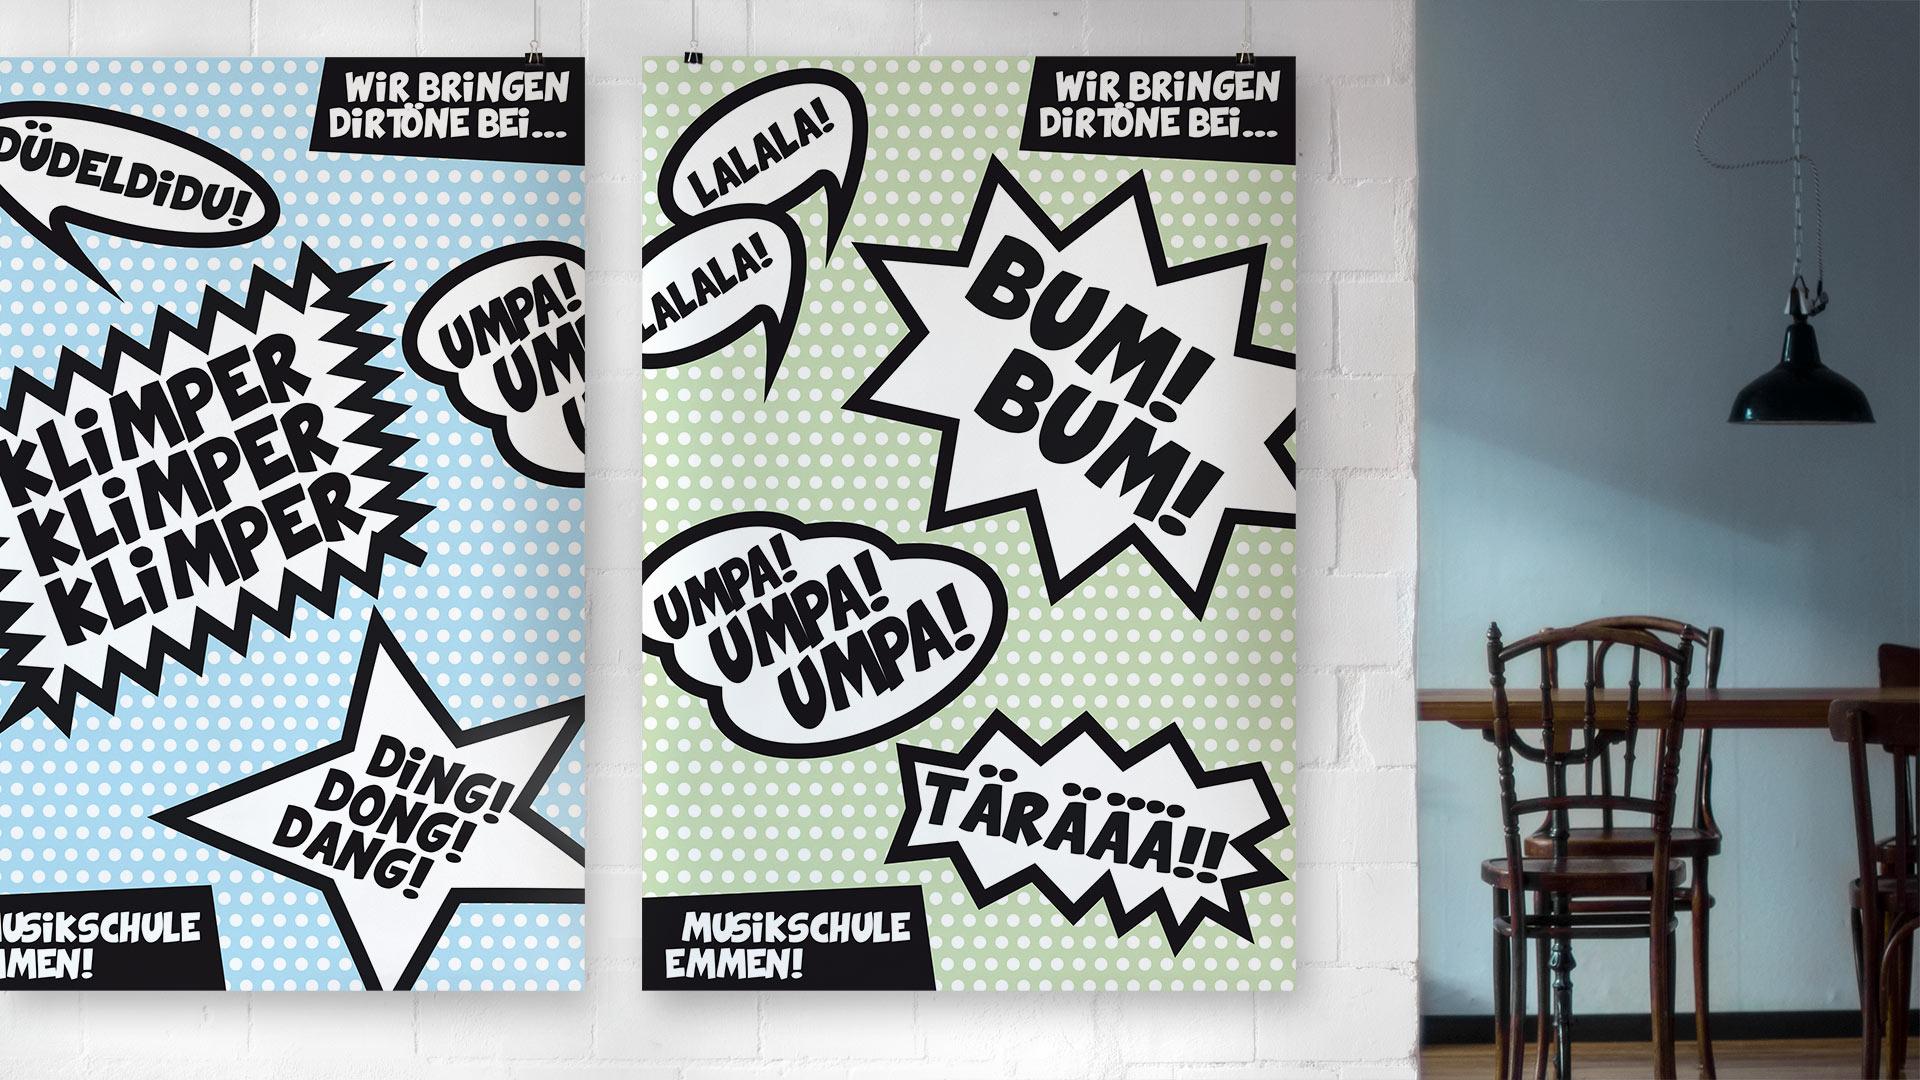 equipe-visuelle-luzern-emmenbruecke-grafik-werbung-musikschule-emmen-plakat-flyer